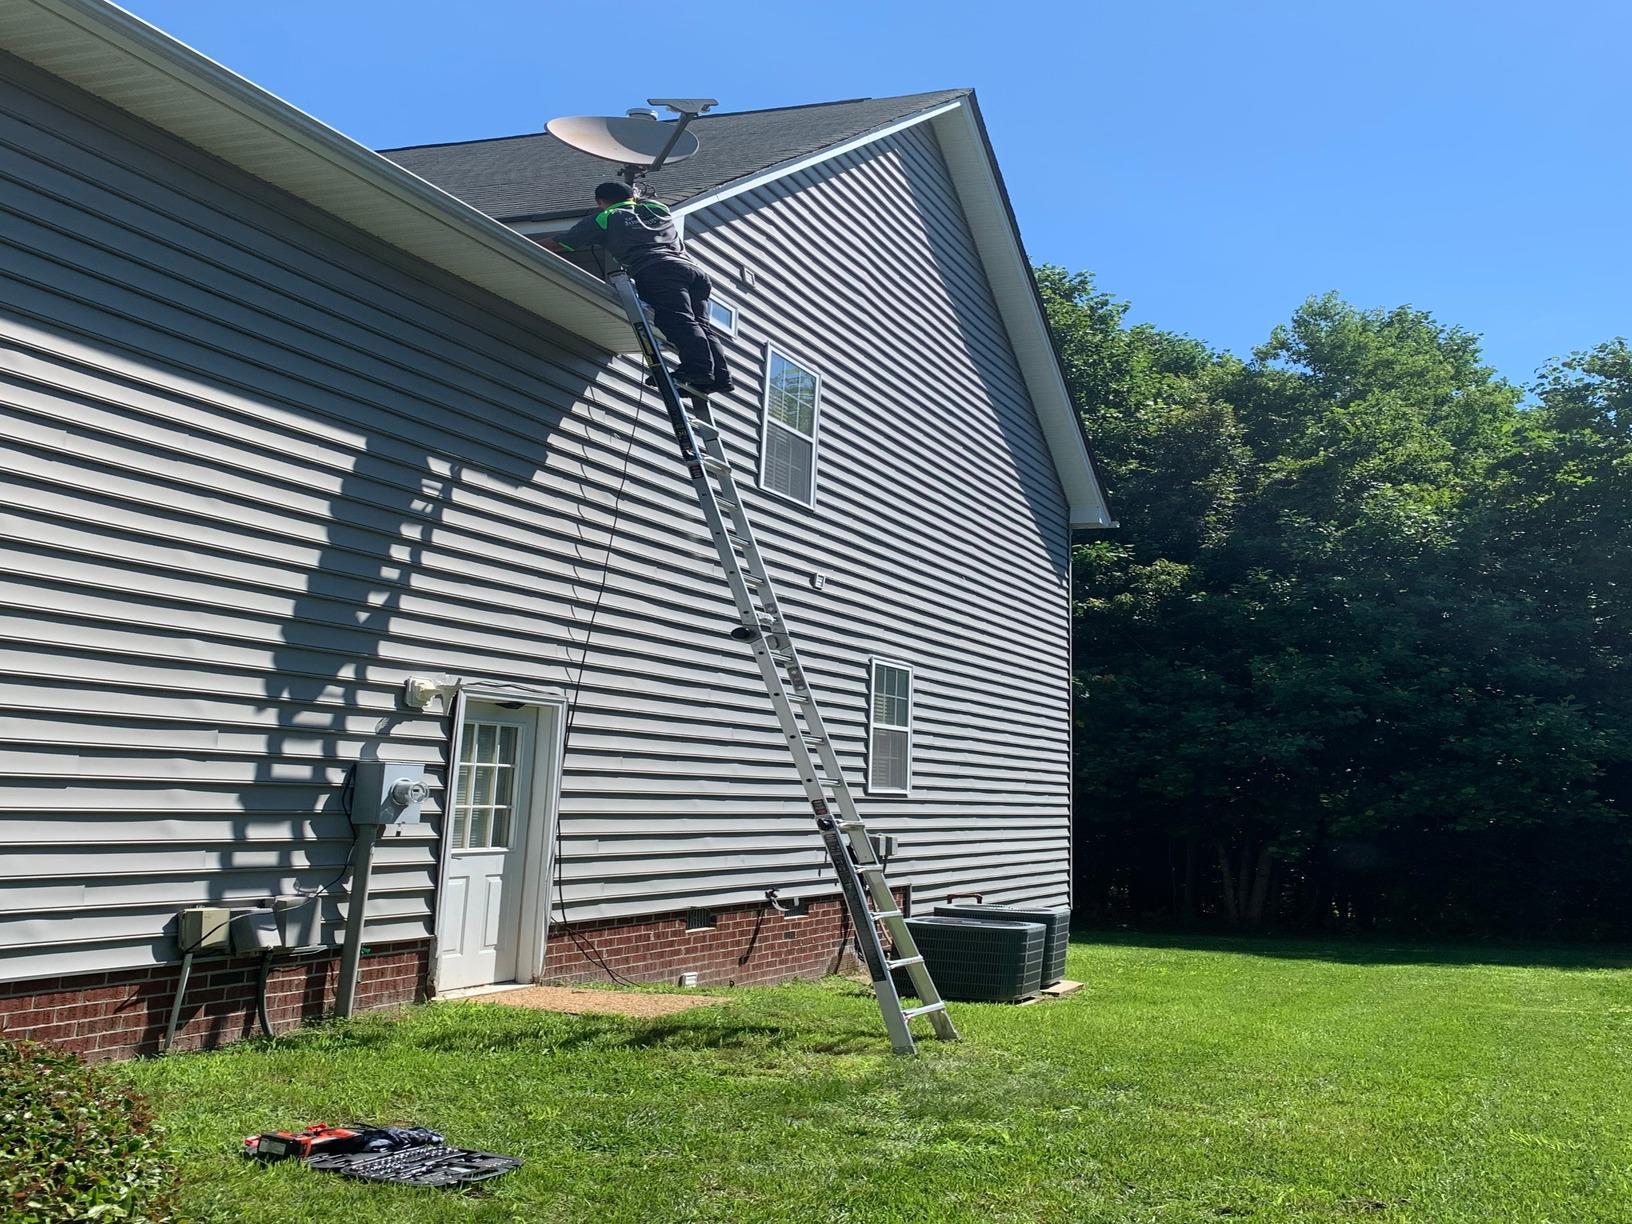 Removing a Satellite Dish in Williamsburg, VA - Before Photo